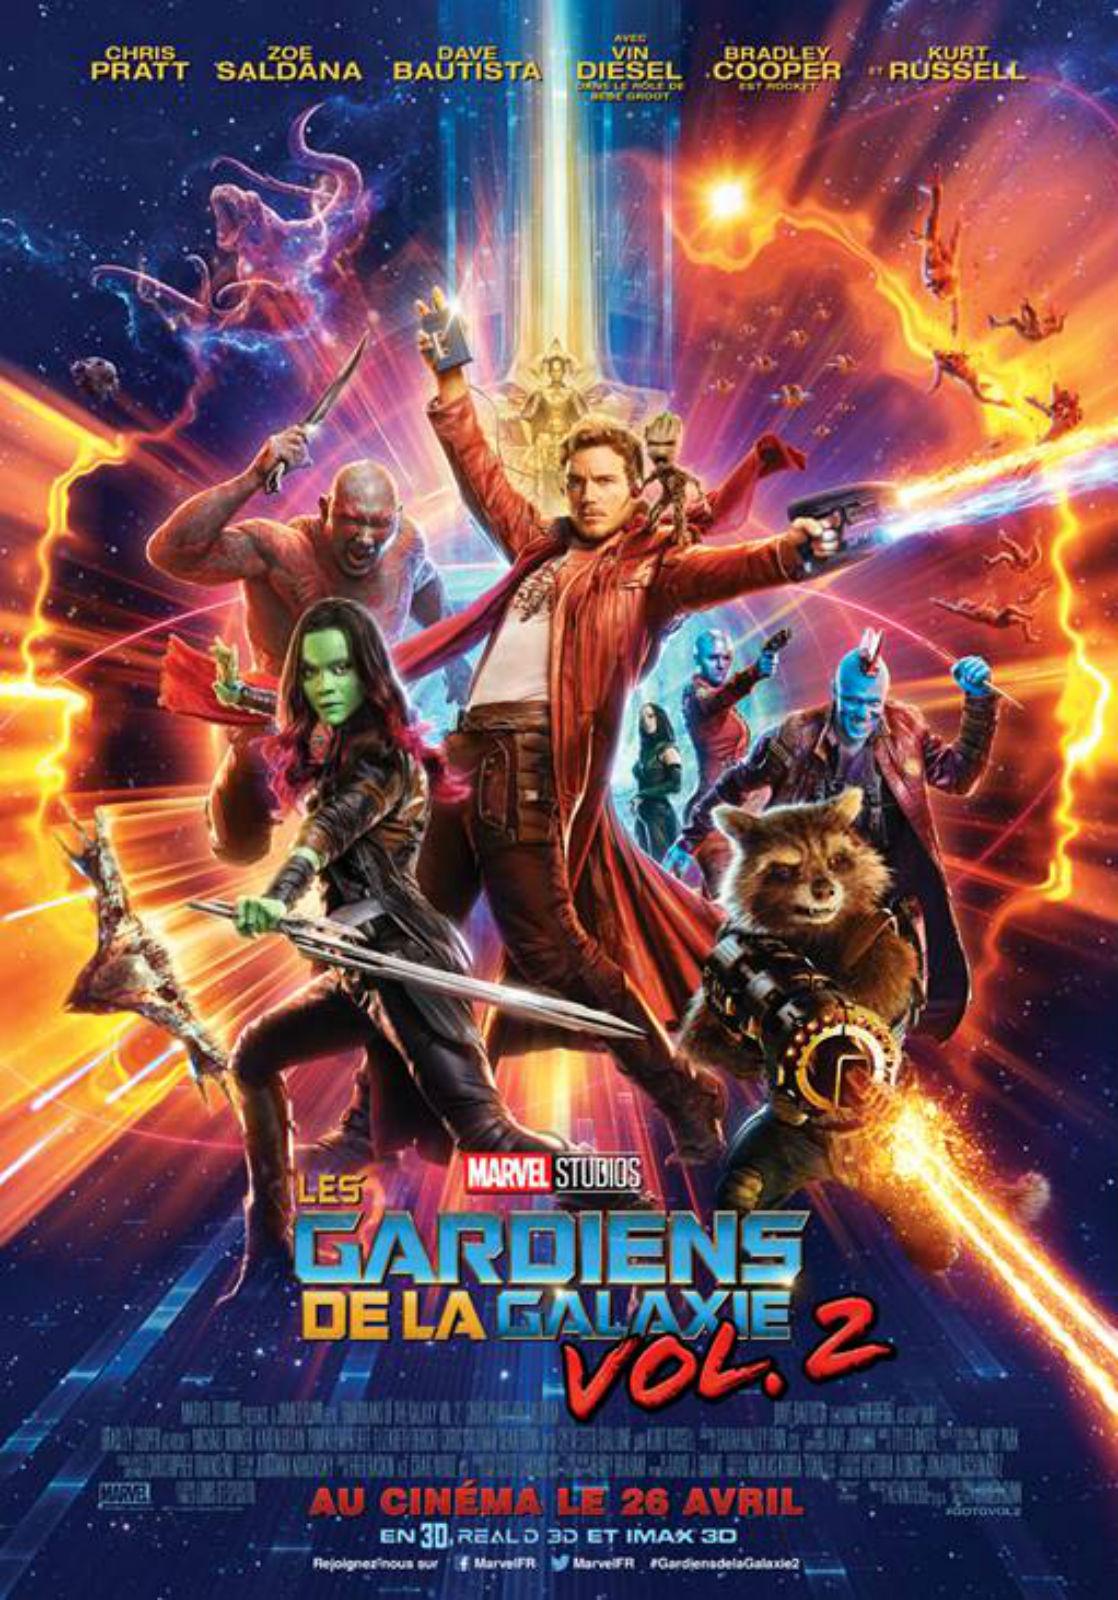 Les gardiens de la galaxie vol. 2 (2017) de James Gunn